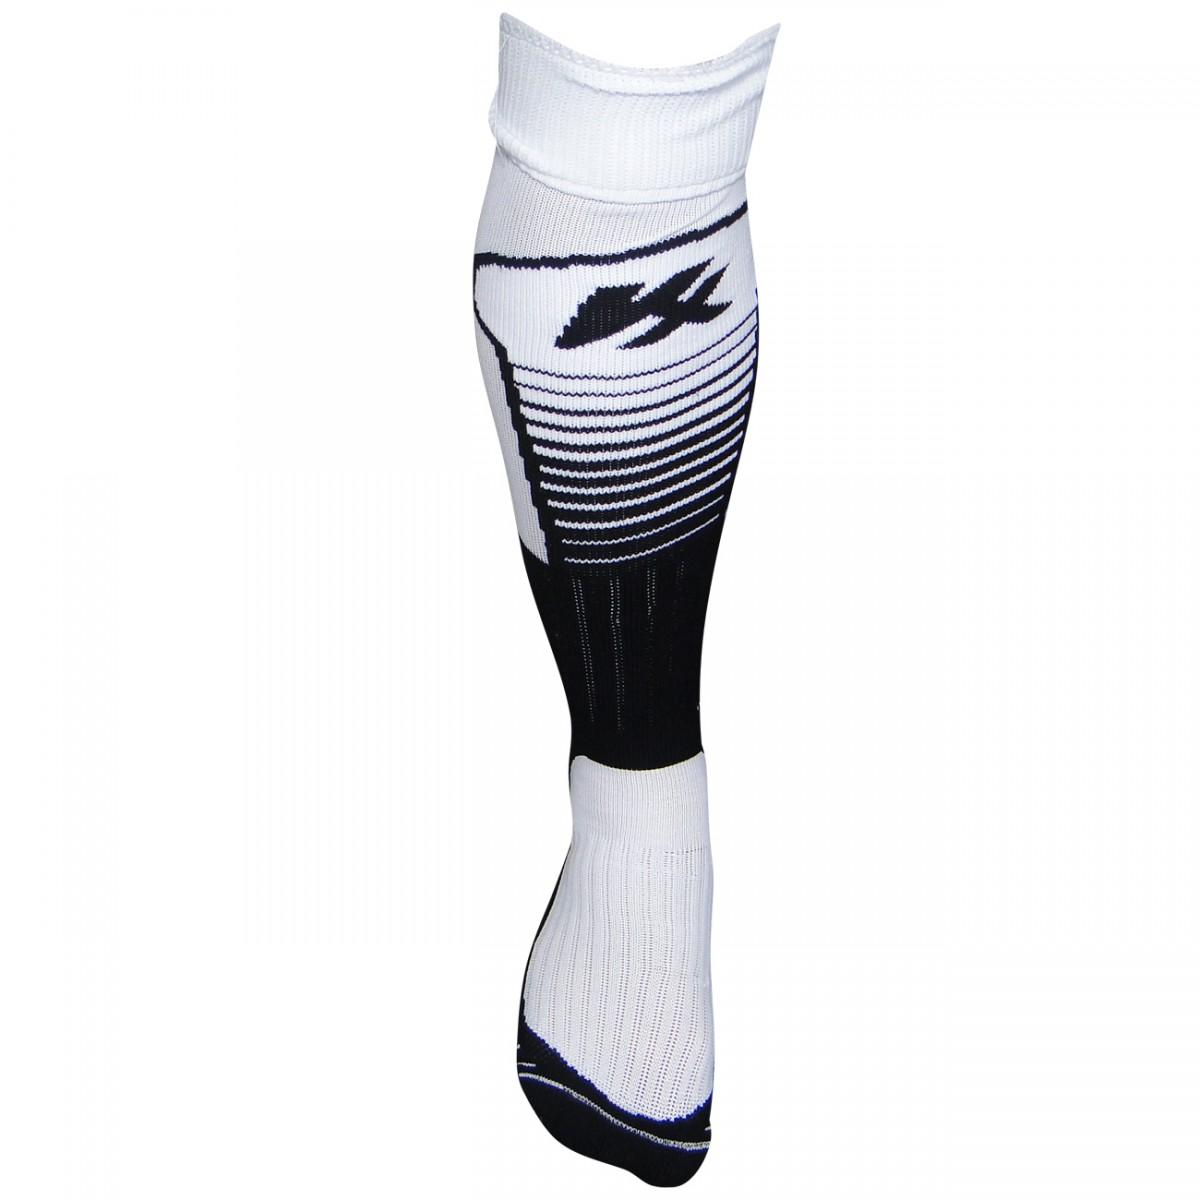 Meiao Kanxa Especial 6109 6109 - Branco Preto - Chuteira Nike ... 6a6f95f27ec7d